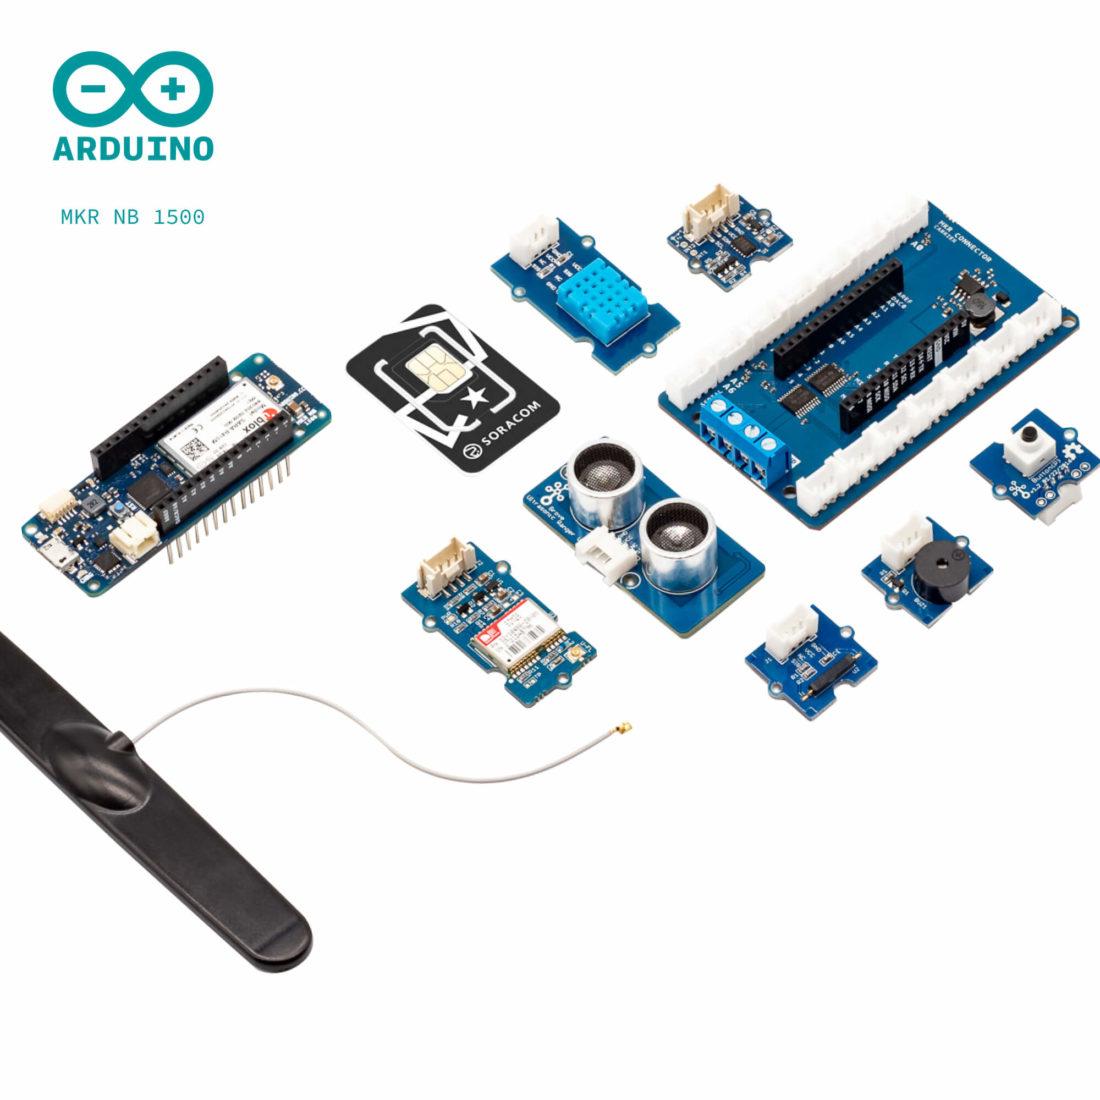 Soracom LTE-M IoT Starter Kit (powered by Arduino)